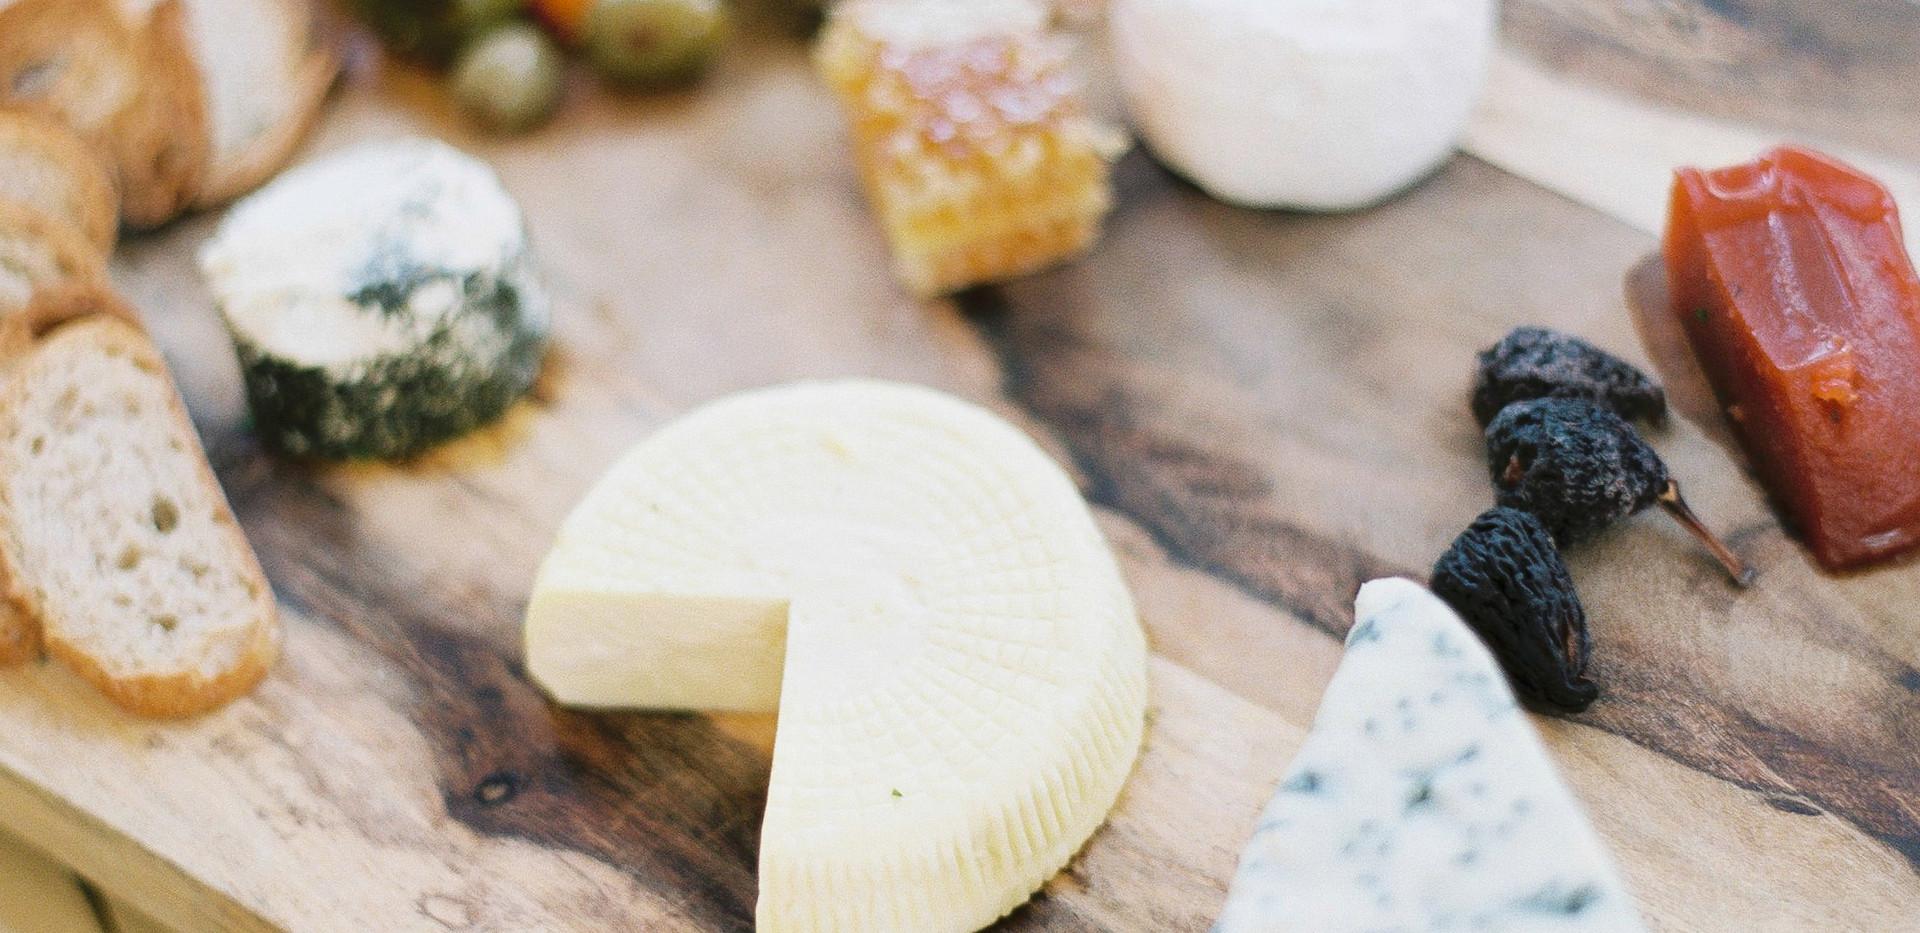 Cheese board.jpg